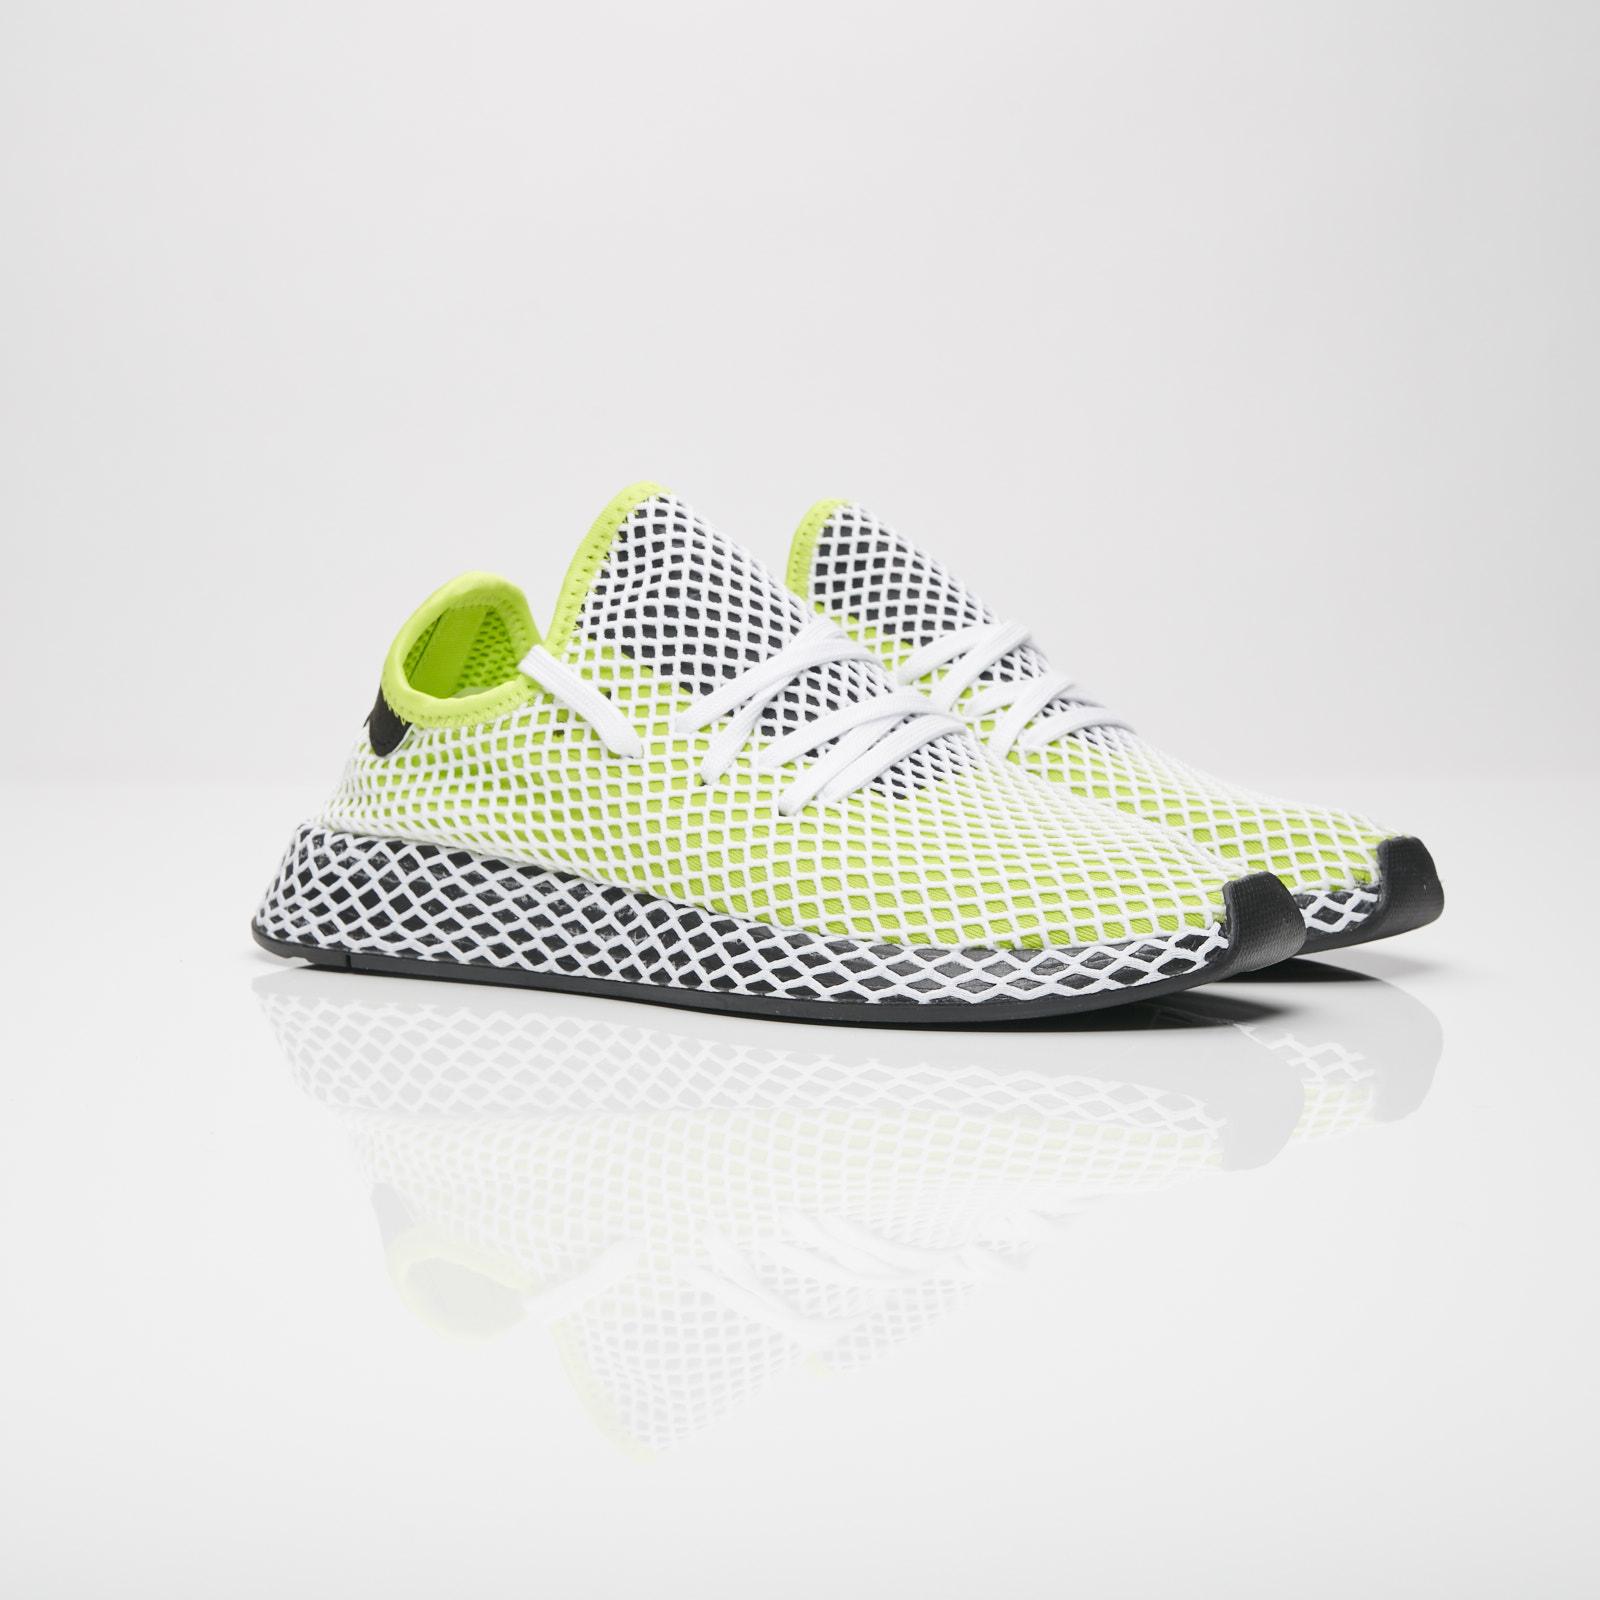 51ff436d1ec55 adidas Deerupt Runner - B27779 - Sneakersnstuff